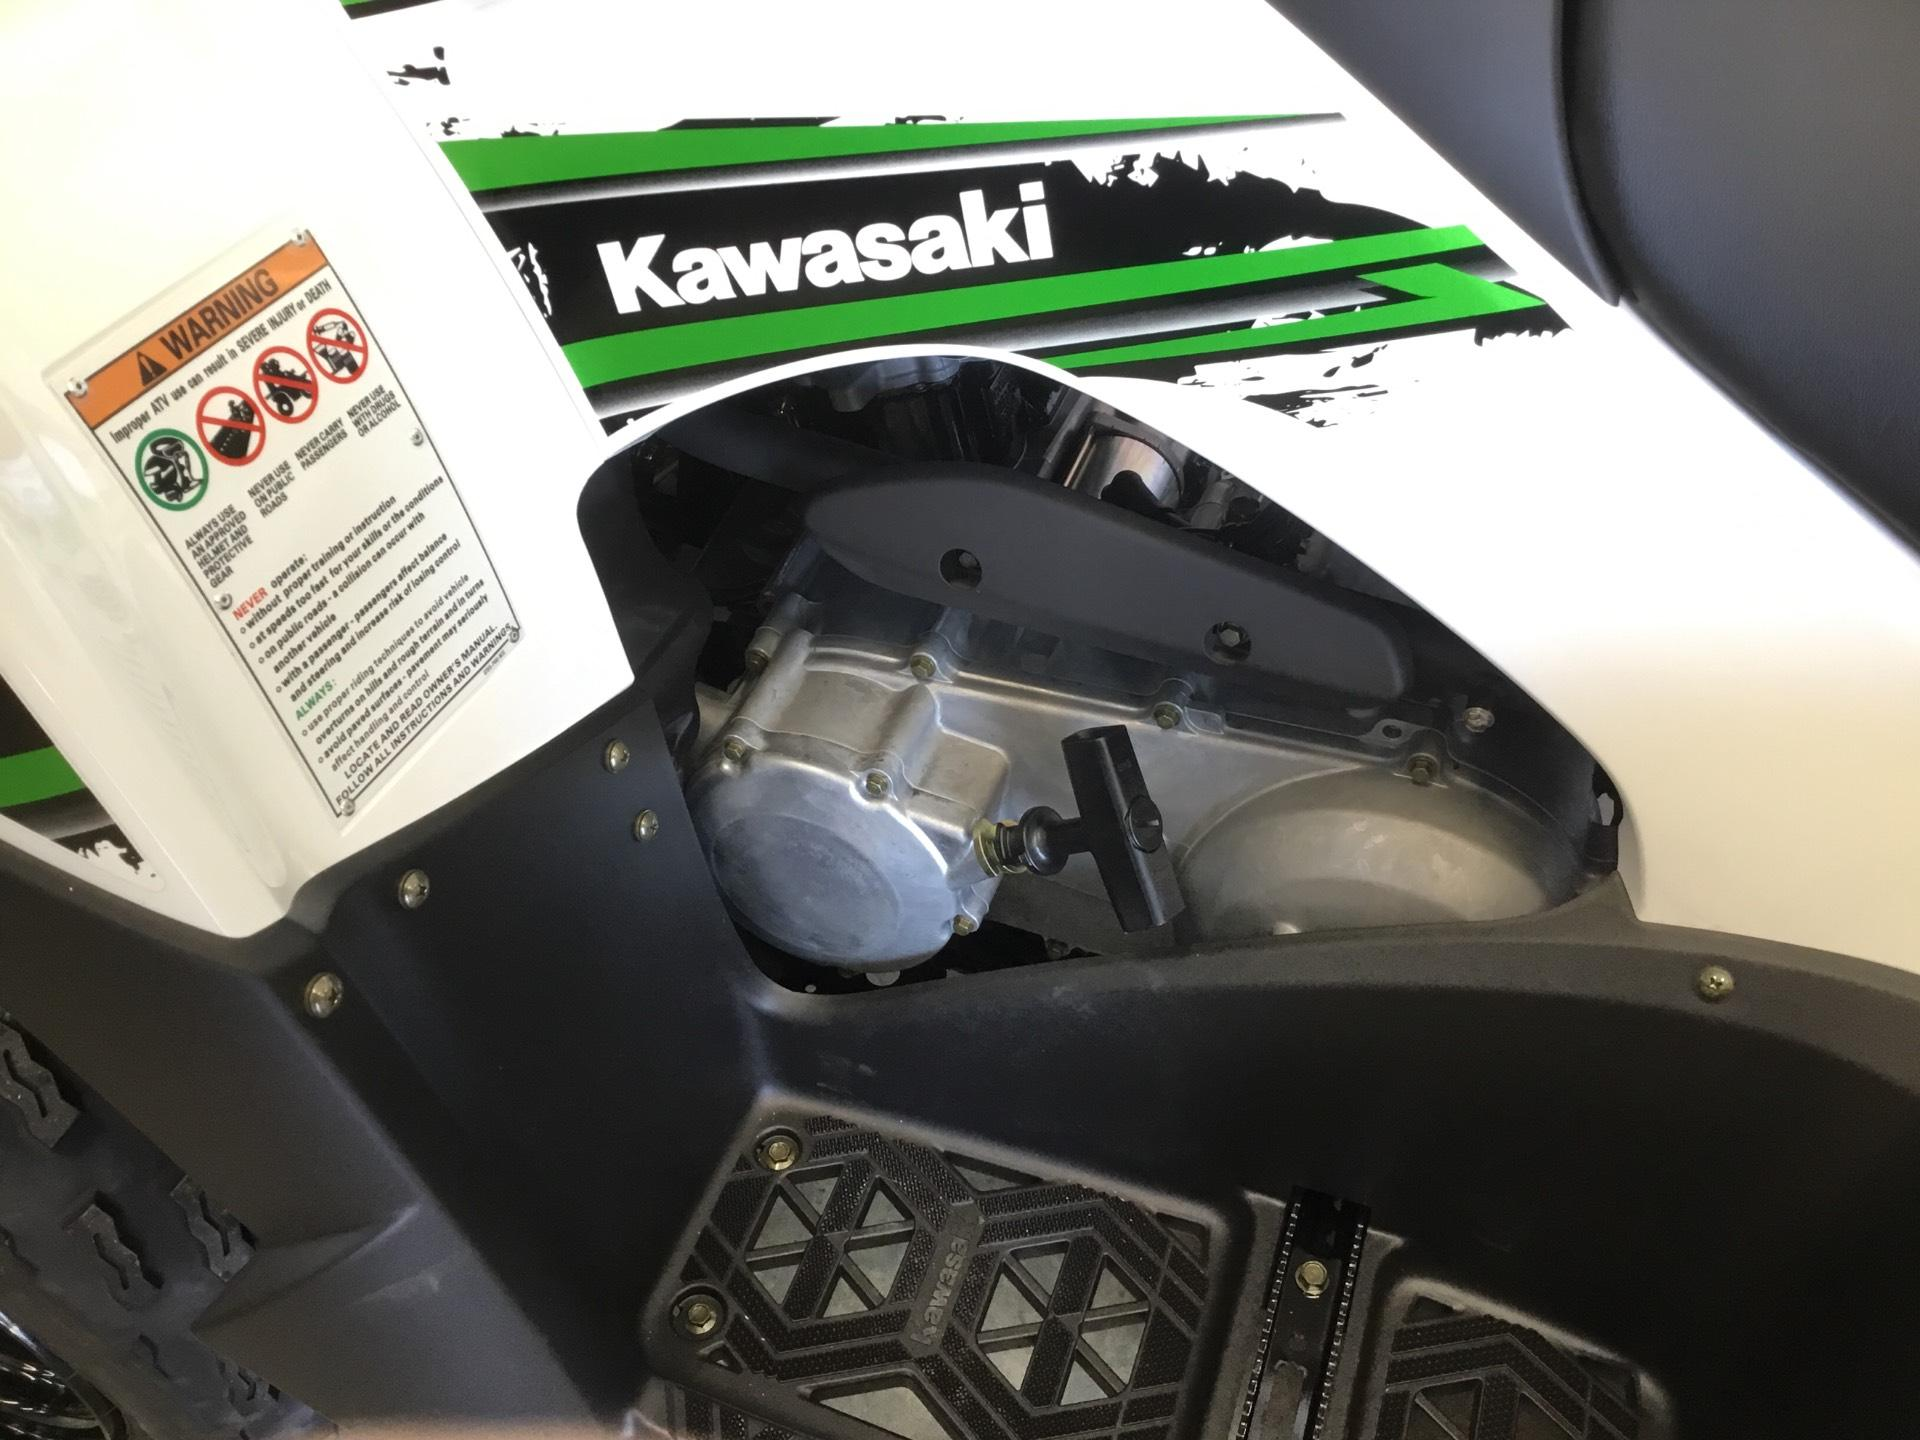 2018 Kawasaki Brute Force 300 In O Fallon Illinois